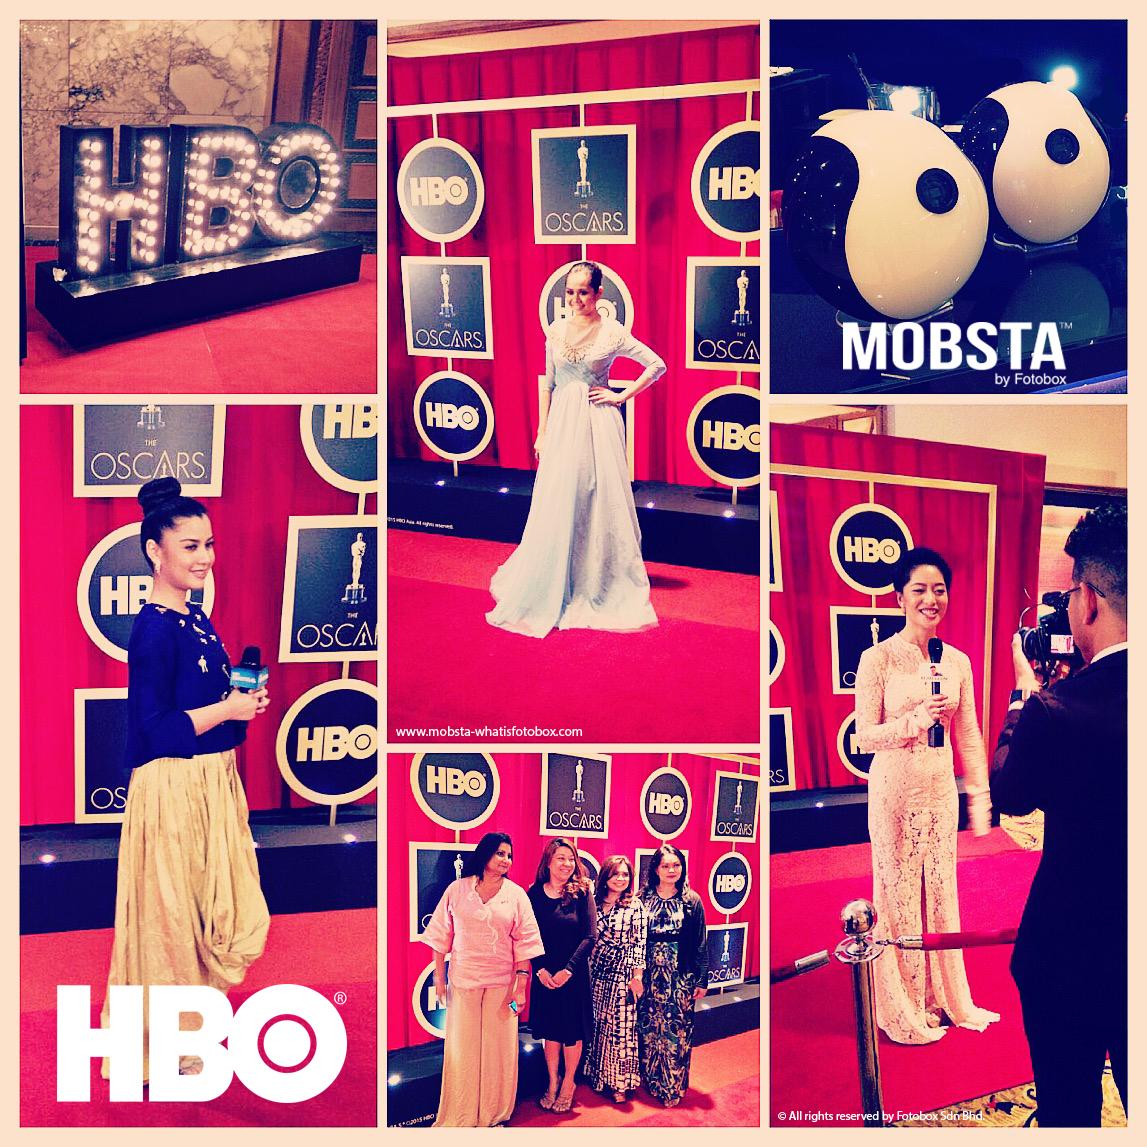 Oscars HBO Mobsta.jpg